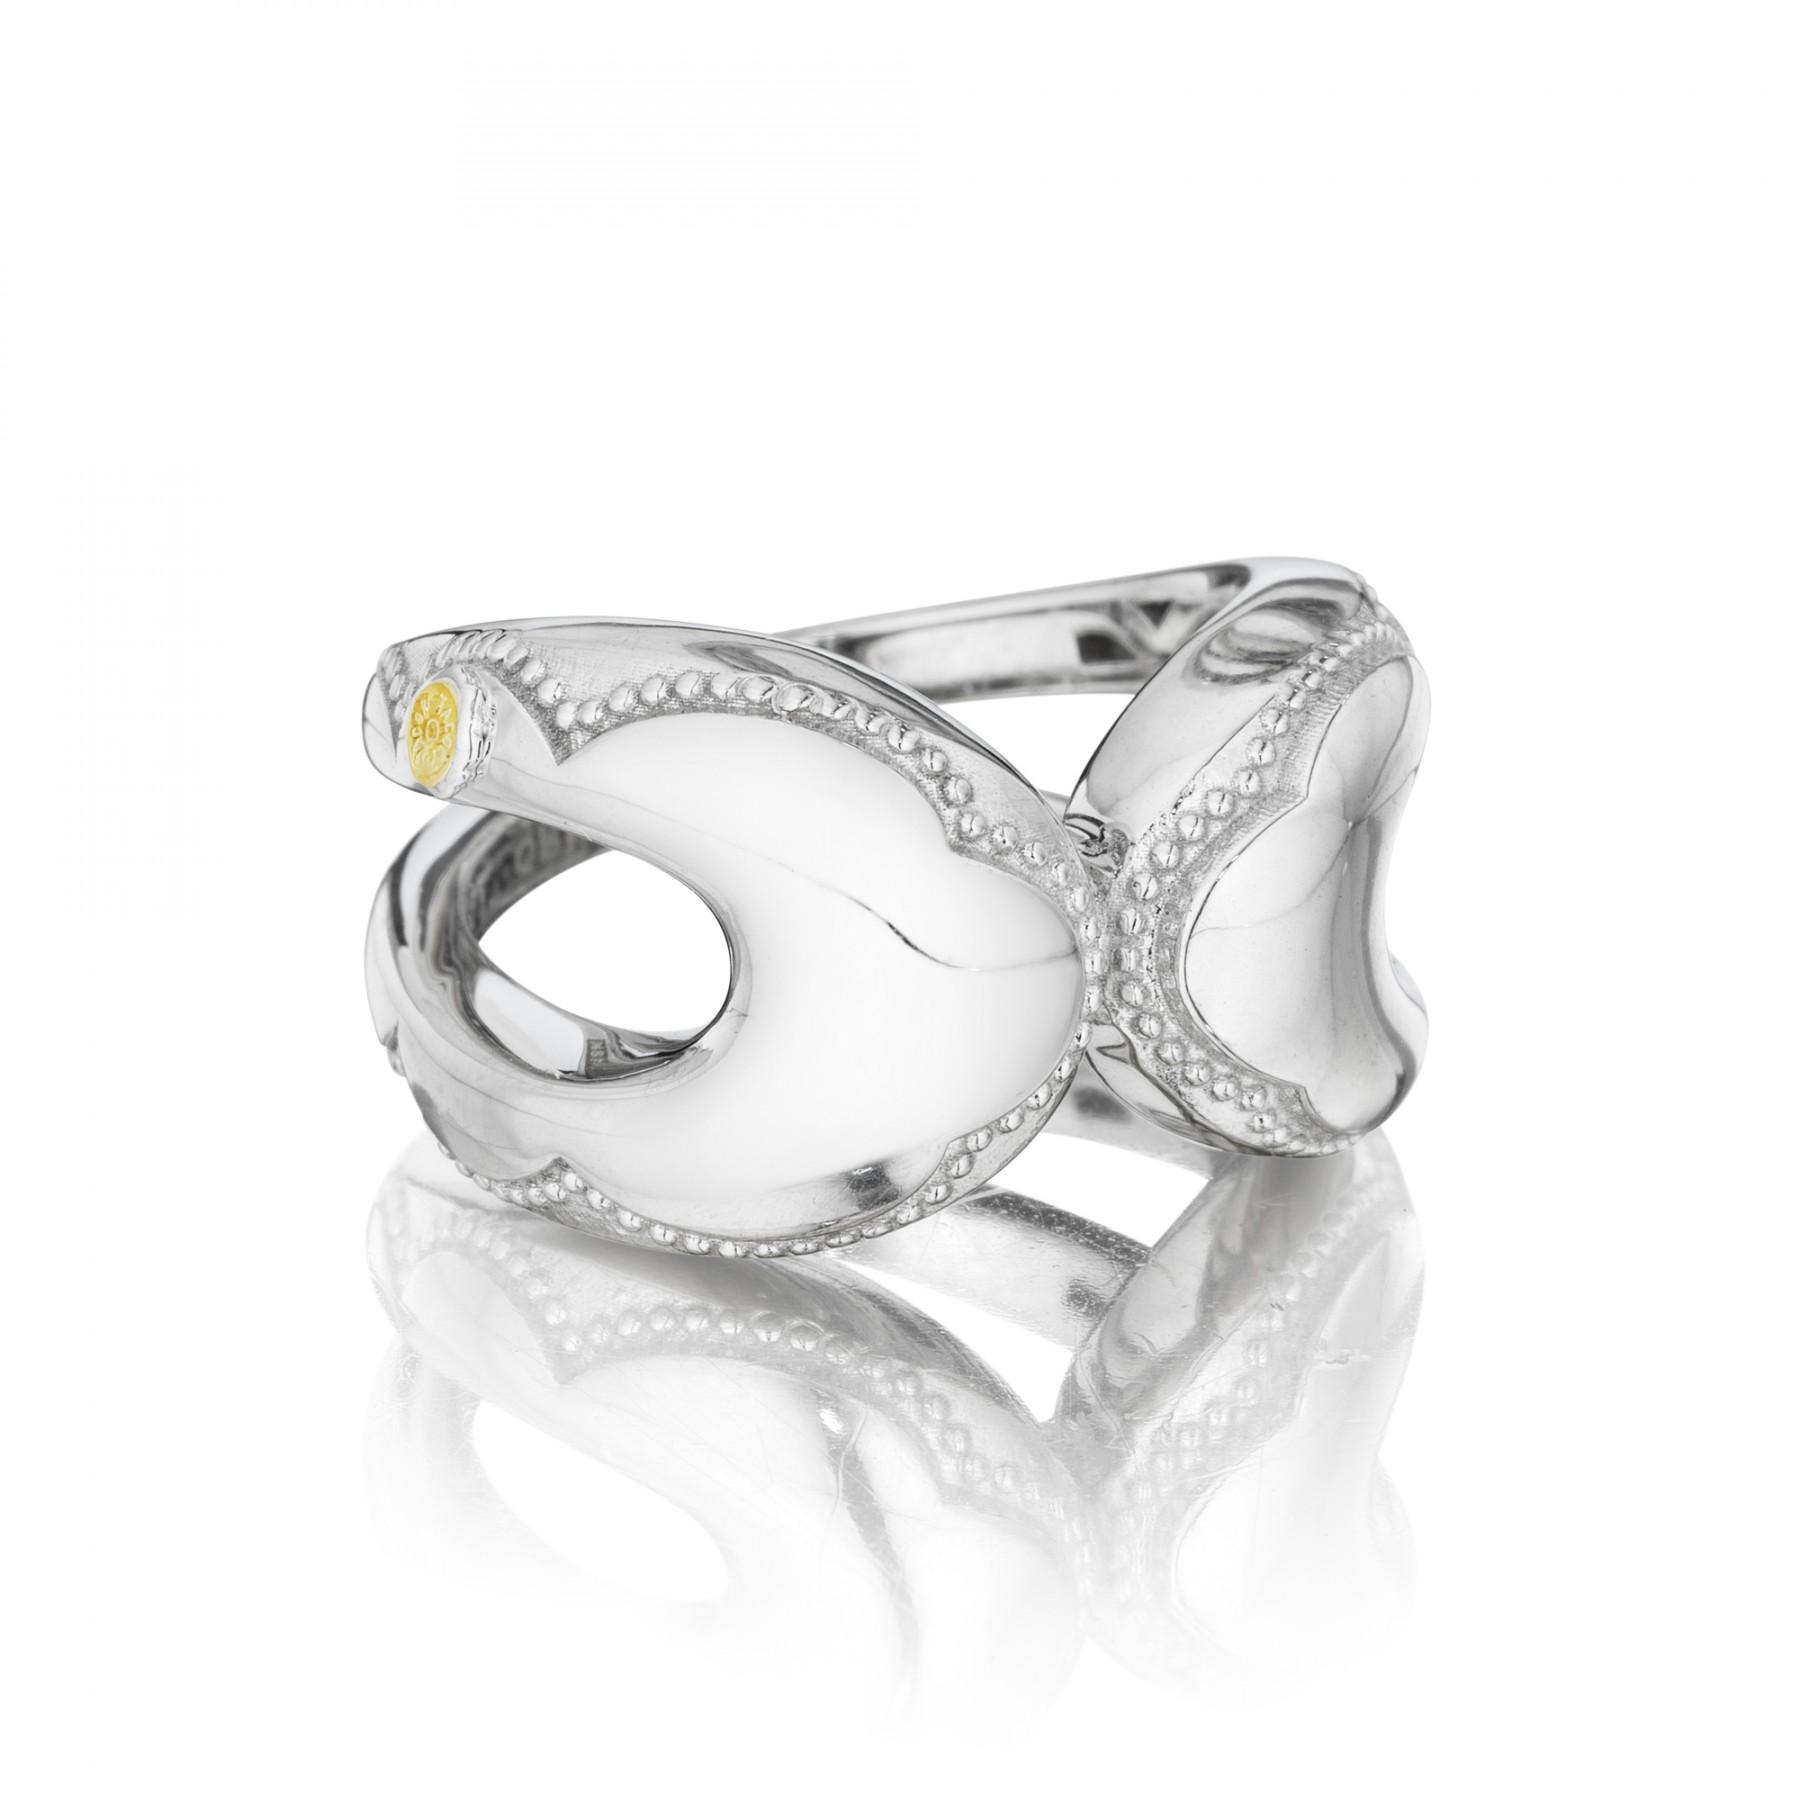 Style# SR162Y - City Lights - Rings - Jewelry - Tacori.com